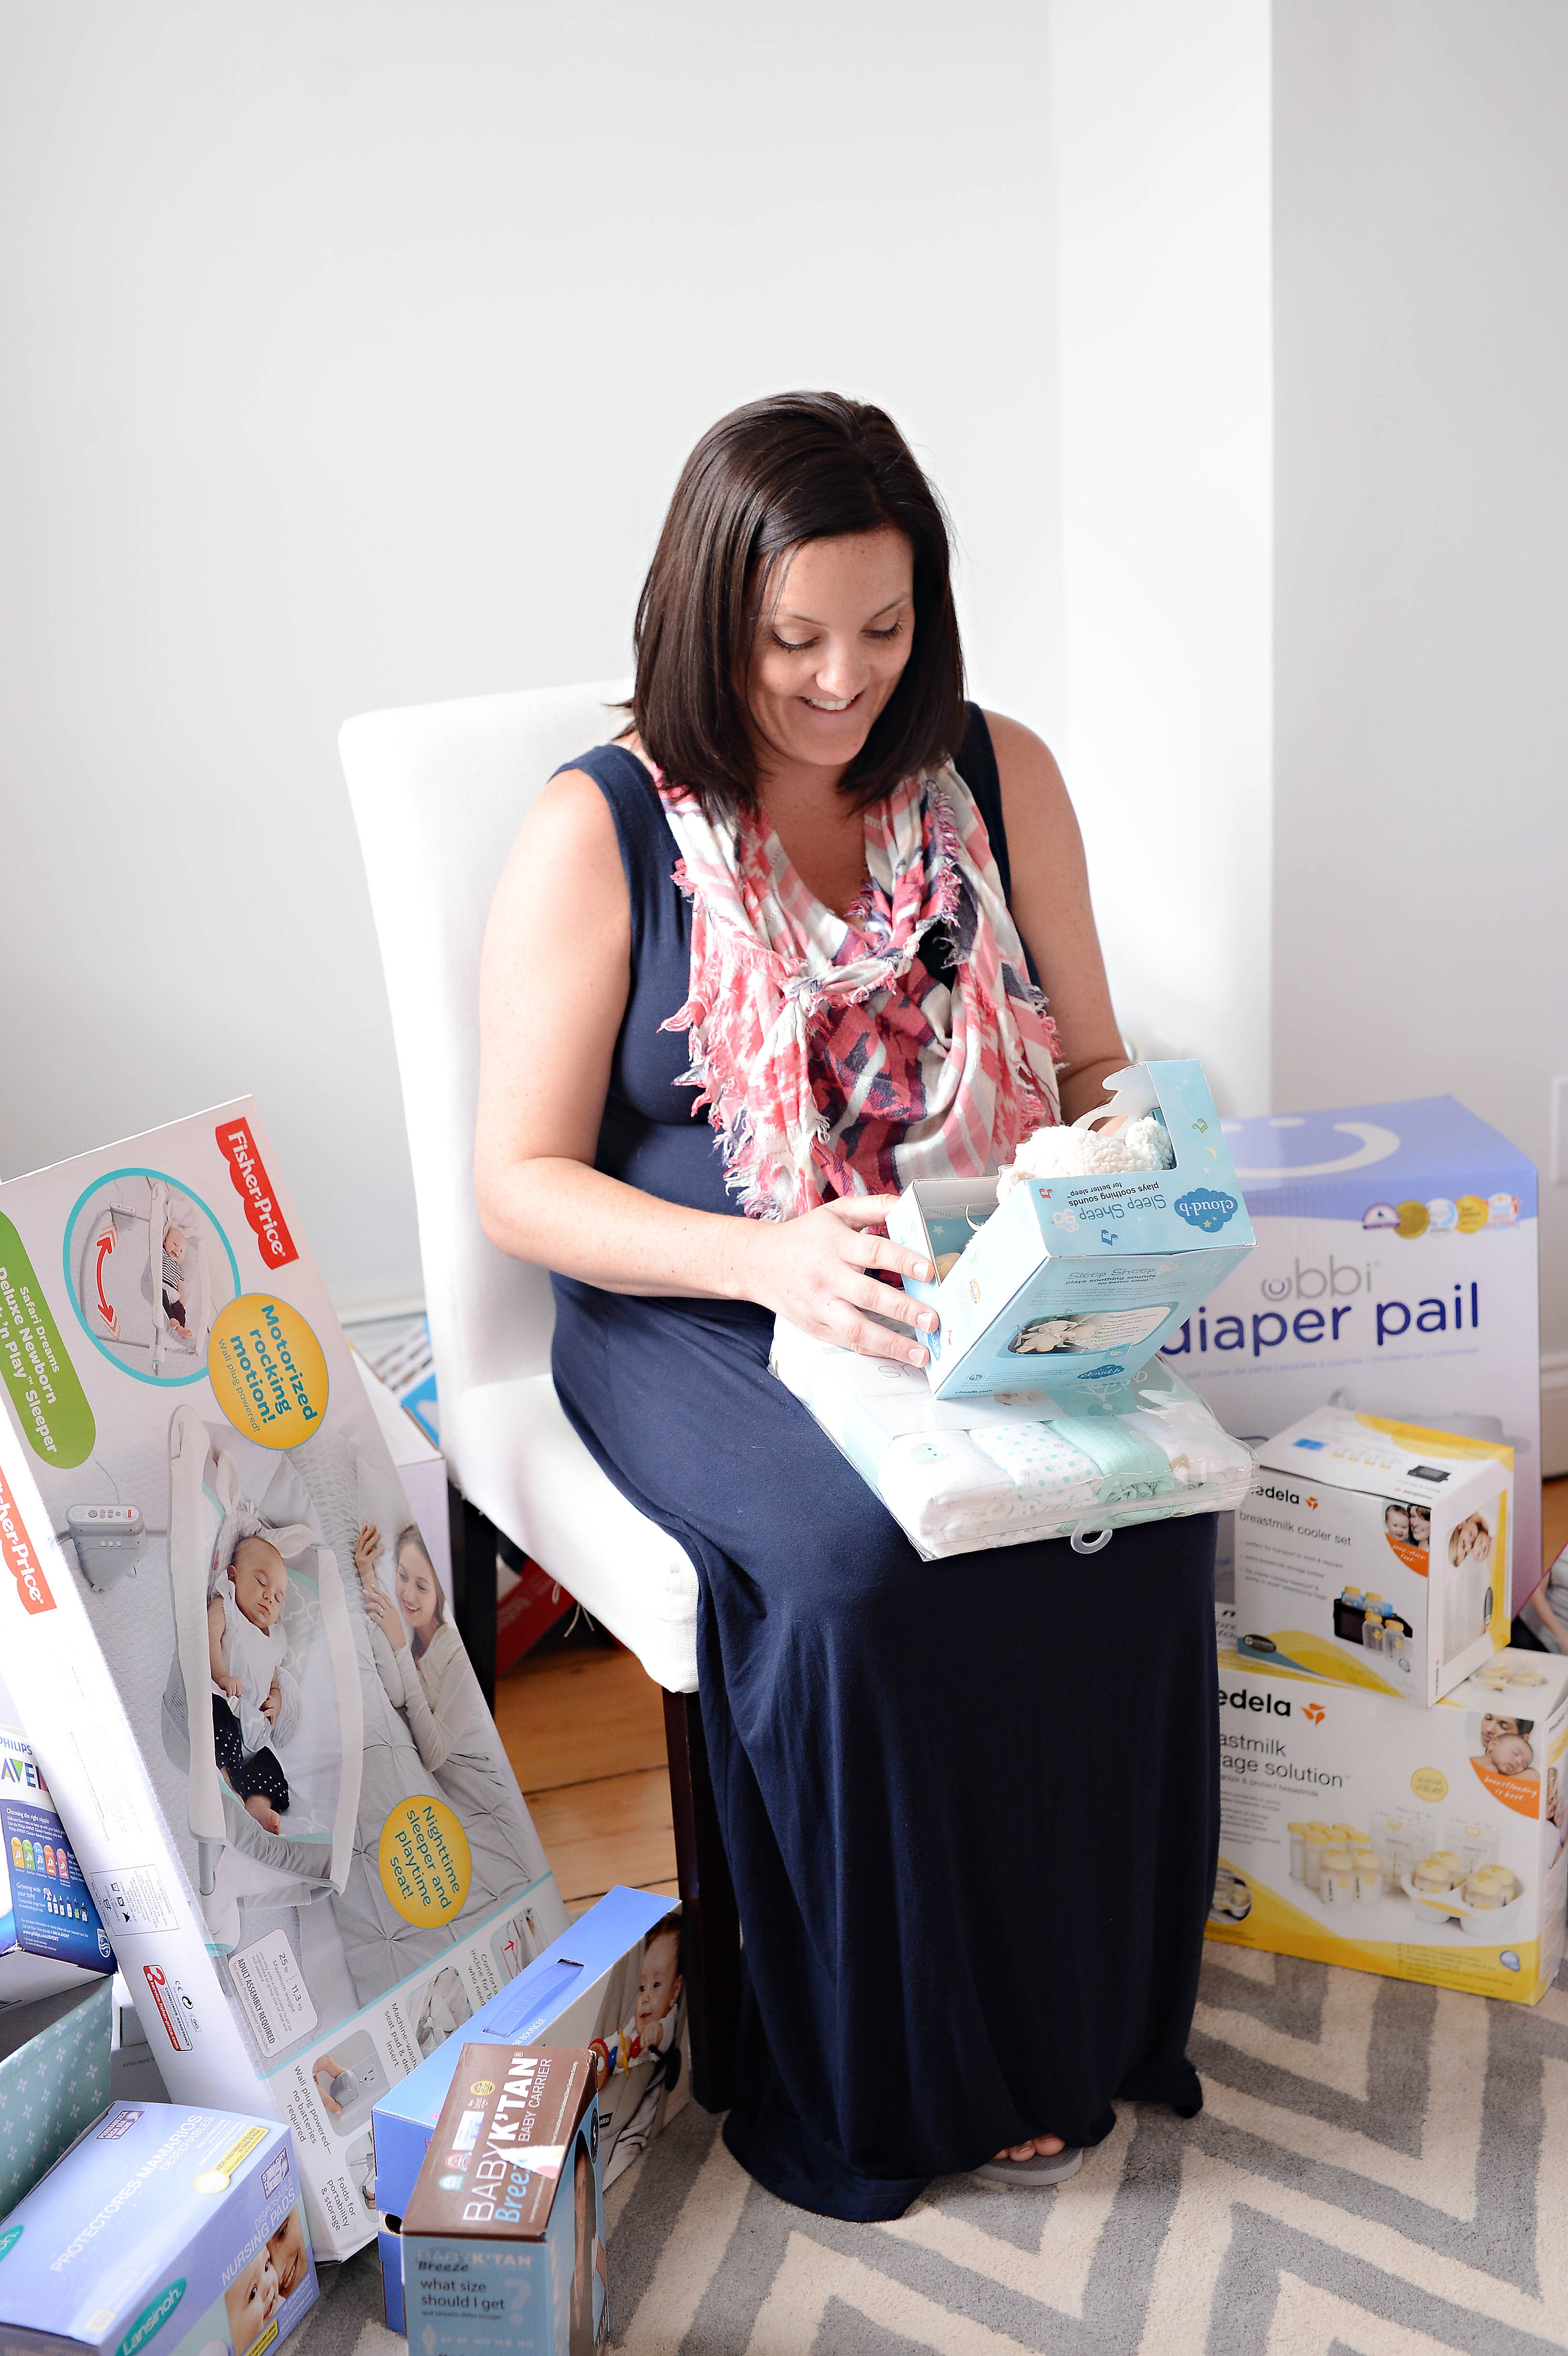 Boston NAPS baby gift guide